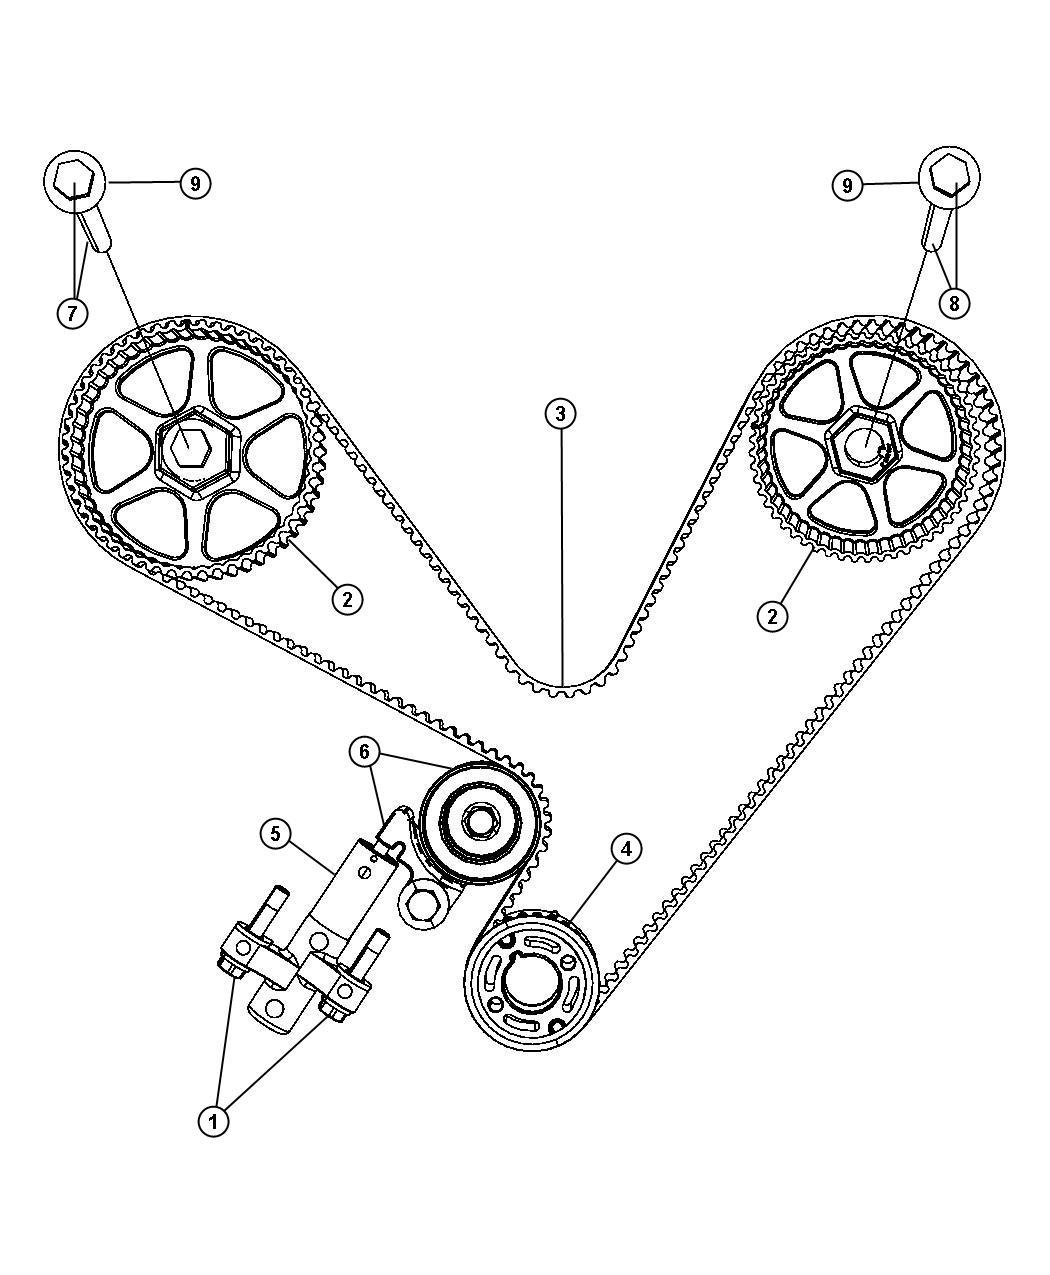 Design Diagram Chrysler Pacifica 4 0 Engine Diagram Full Version Hd Quality Engine Diagram